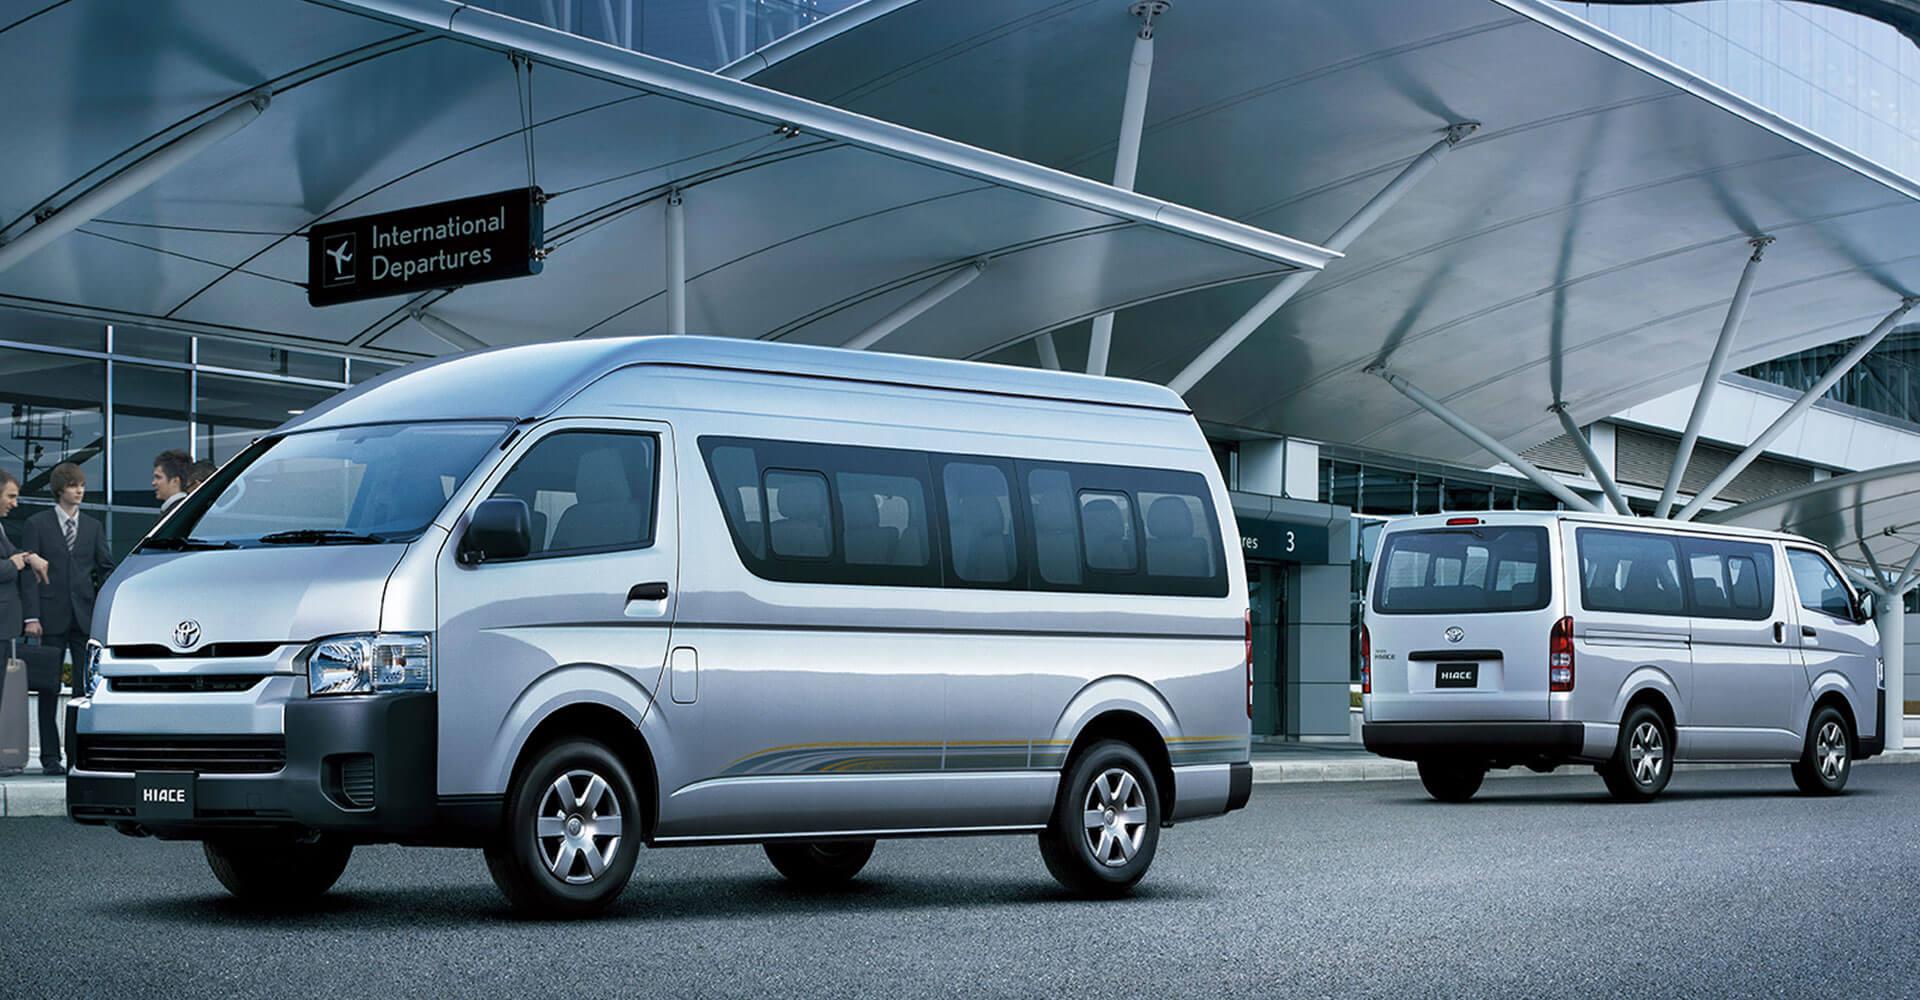 2021 Toyota Hiace Concept